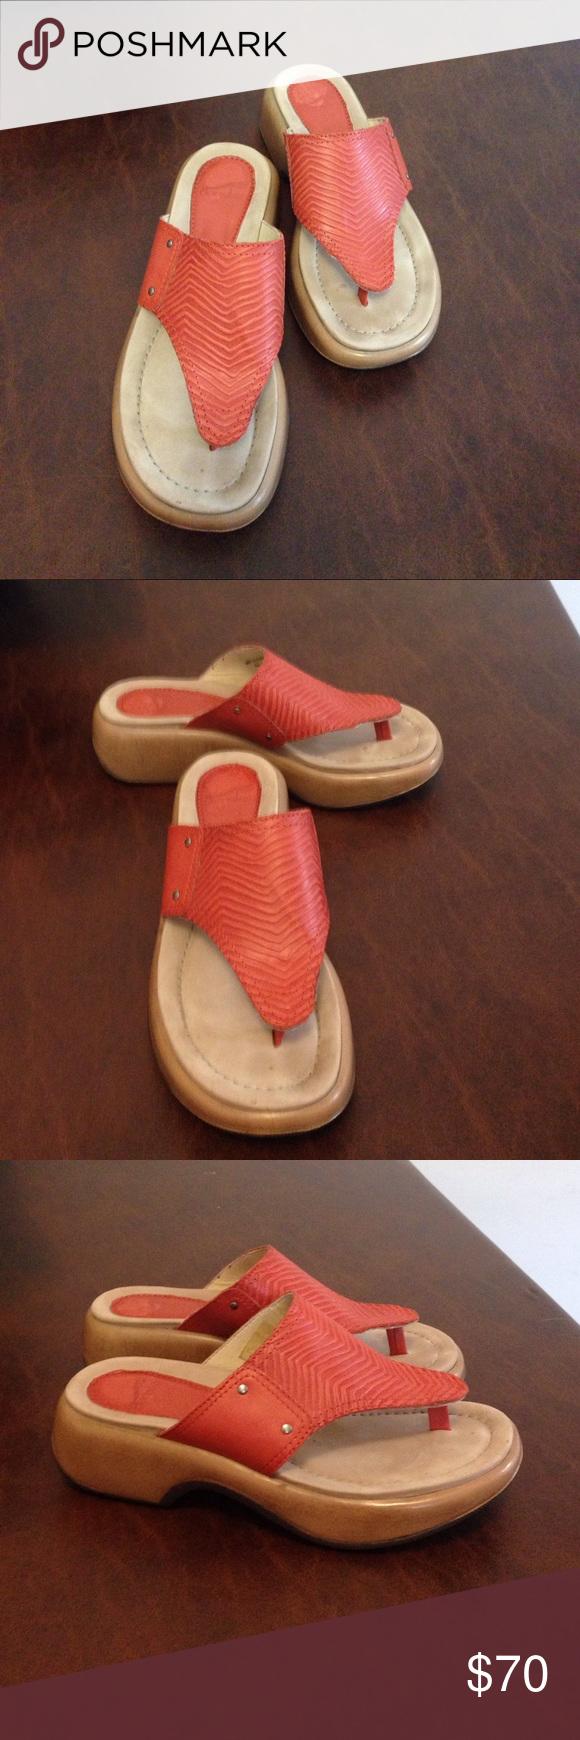 Dansko  sandals size 6 / 36 Dansko Orange sandal size 6/36. Great condition Dansko Shoes Sandals